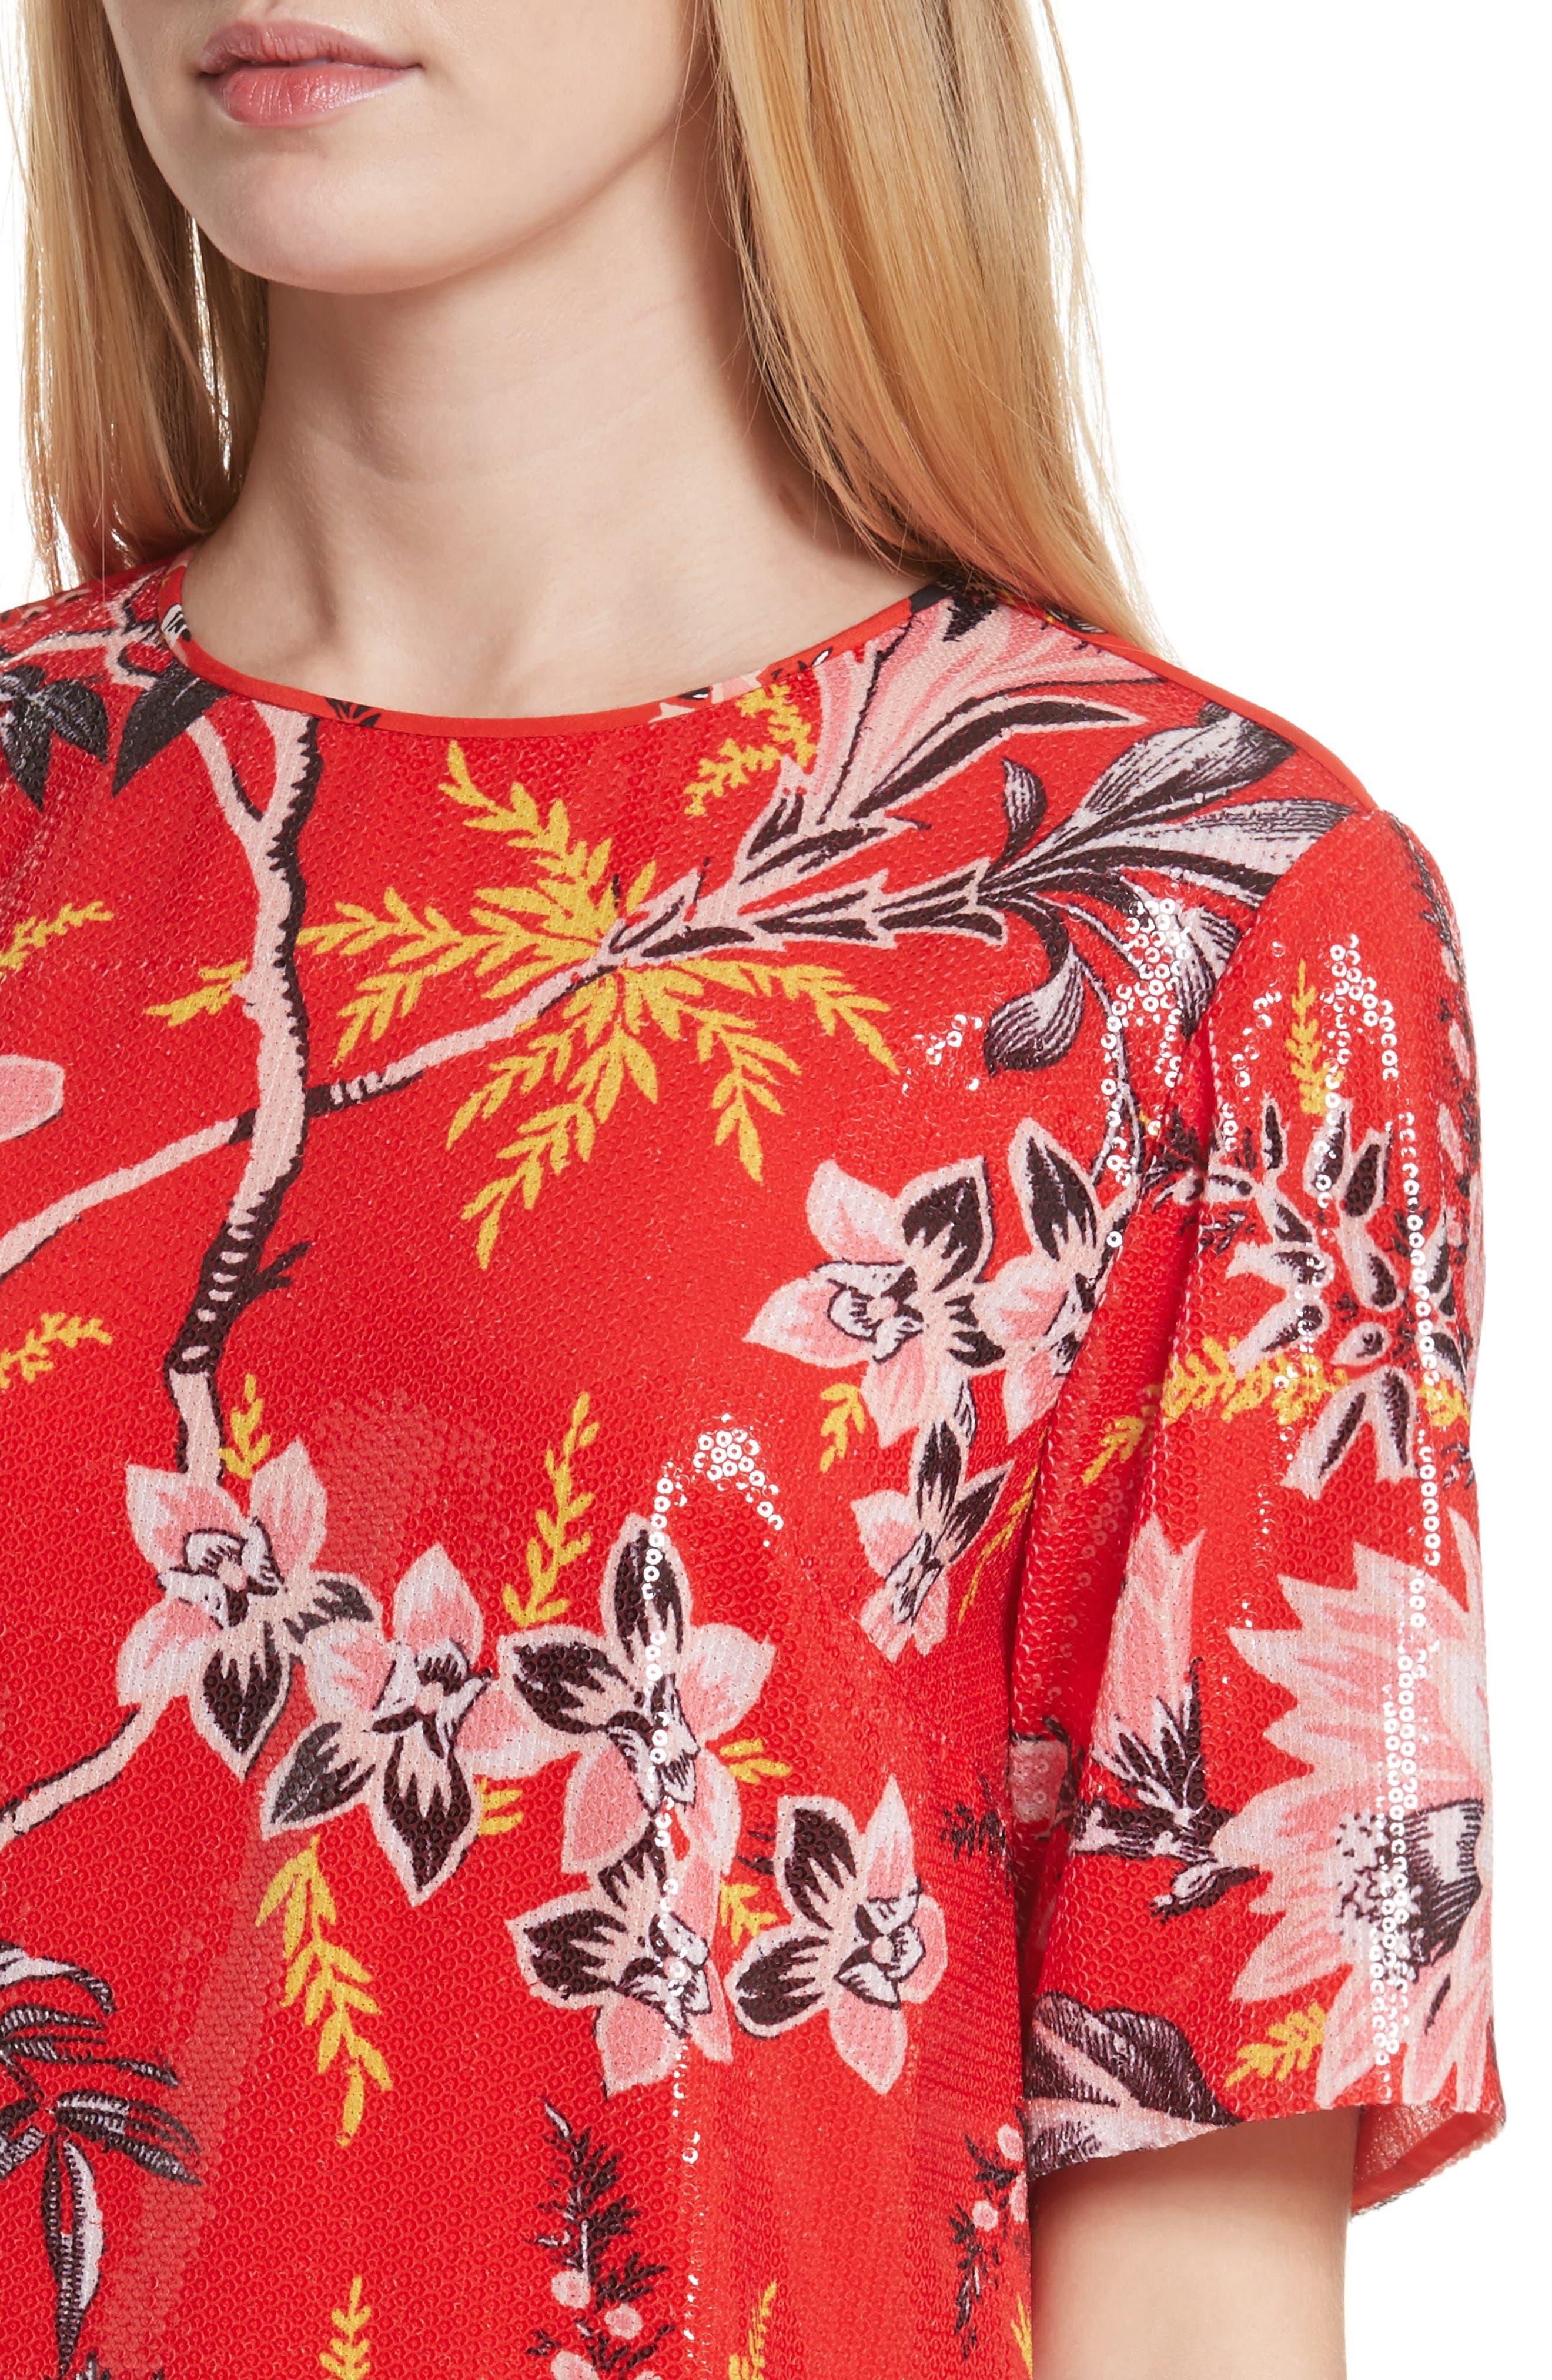 Diane von Furstenberg Fluid Sequin Minidress,                             Alternate thumbnail 4, color,                             Avalon Poppy